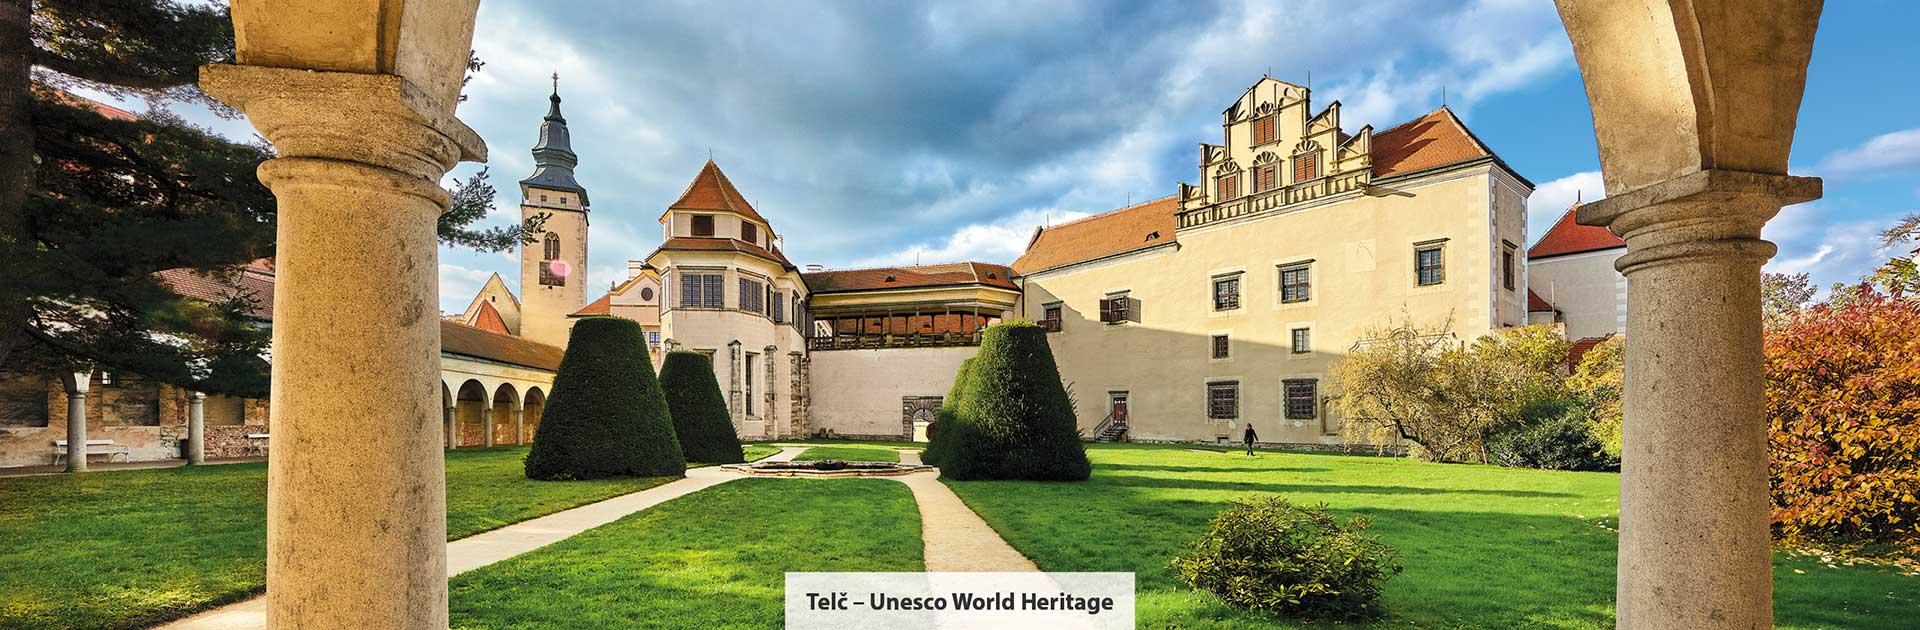 Telč - Unesco World Heritage